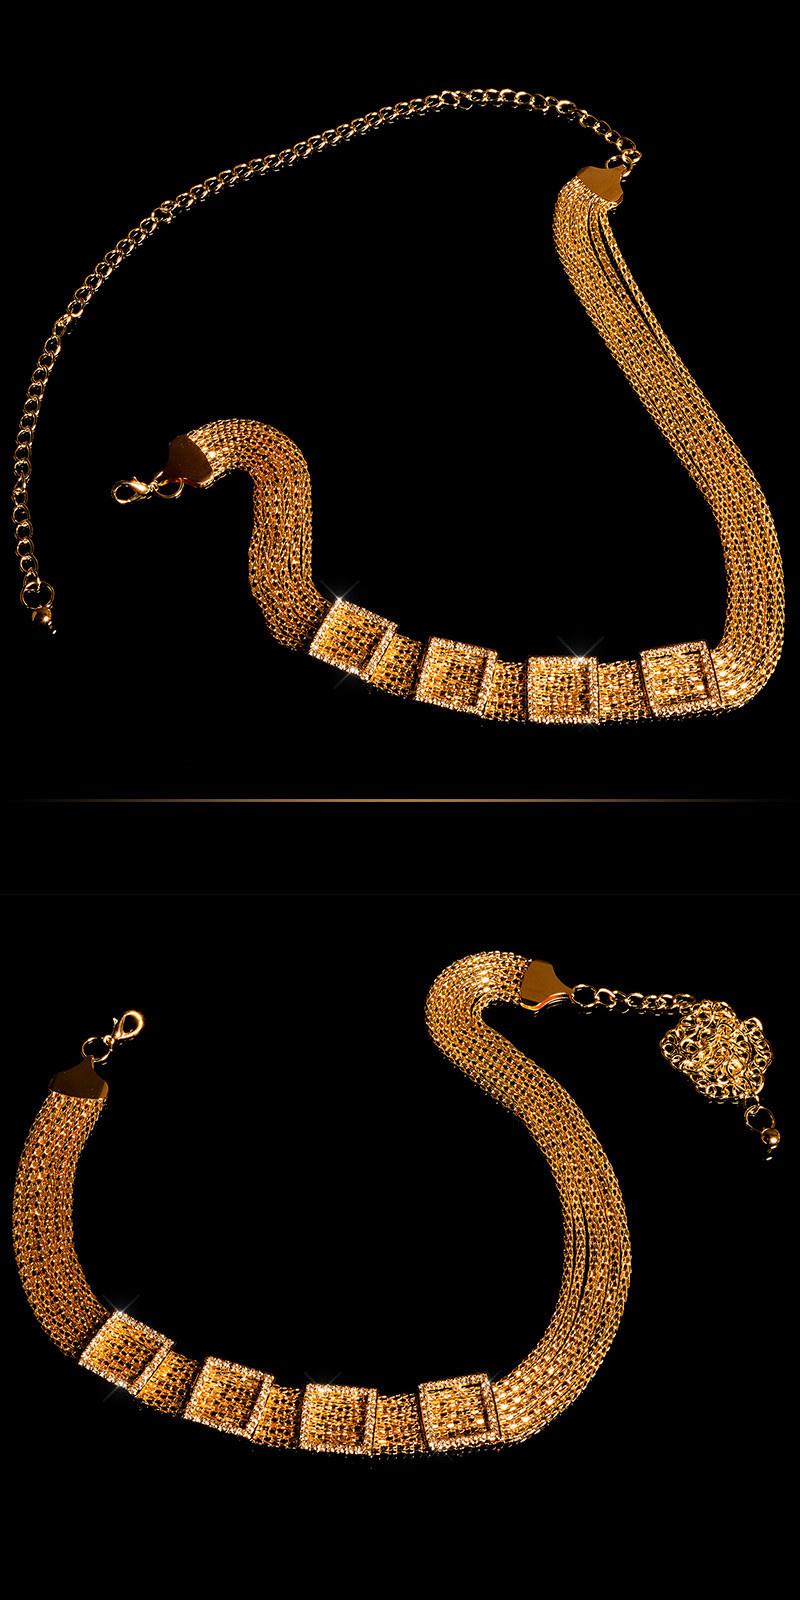 Trendy chain belt with rhinestones Gold